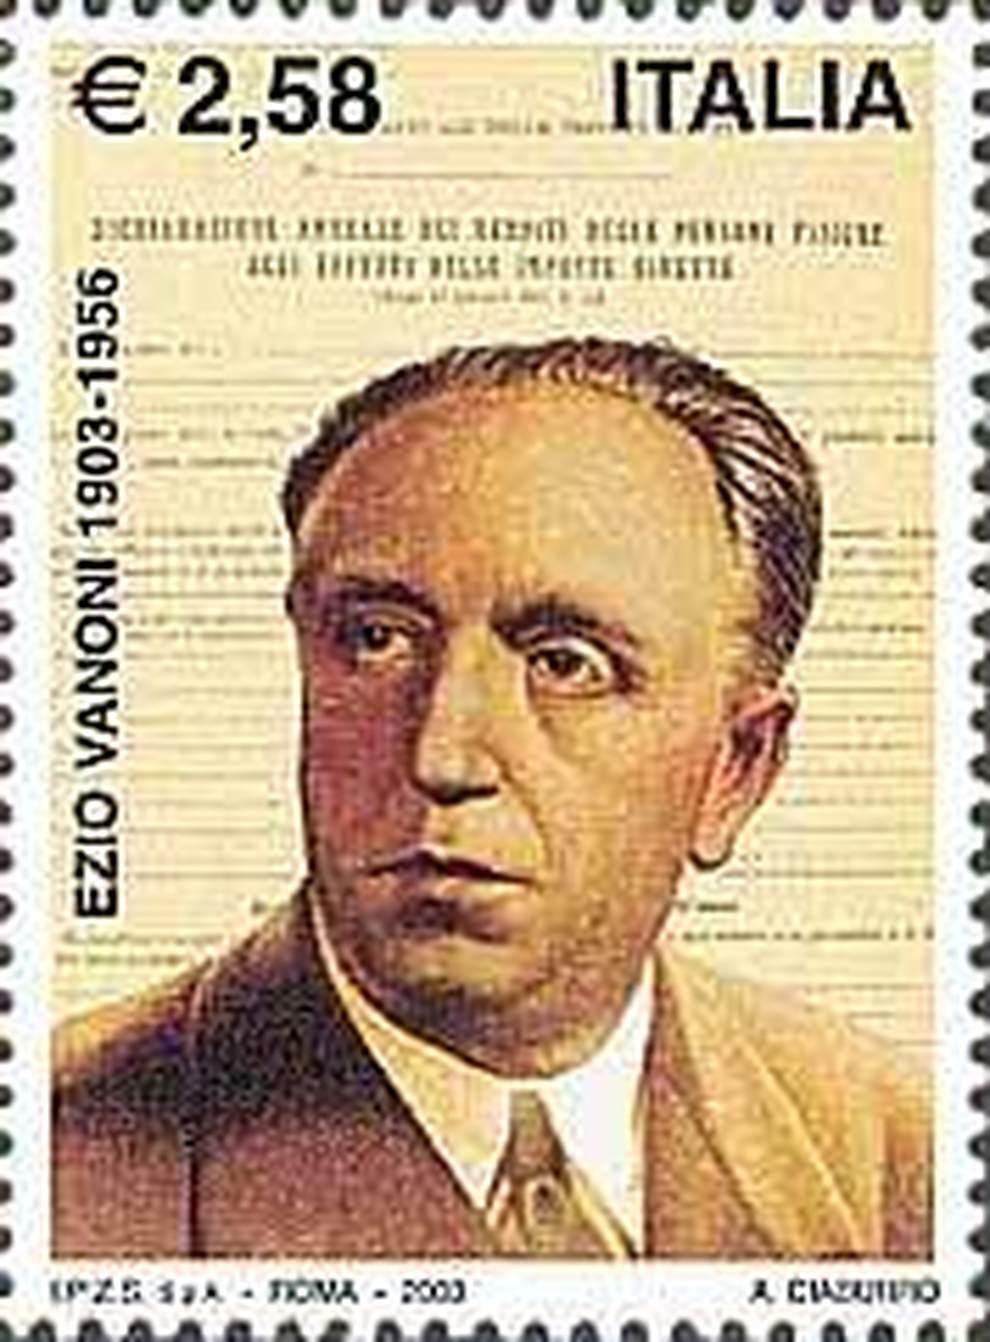 16 febbraio 1956 Muore a Roma l'ex ministro ed economista Ezio Vanoni